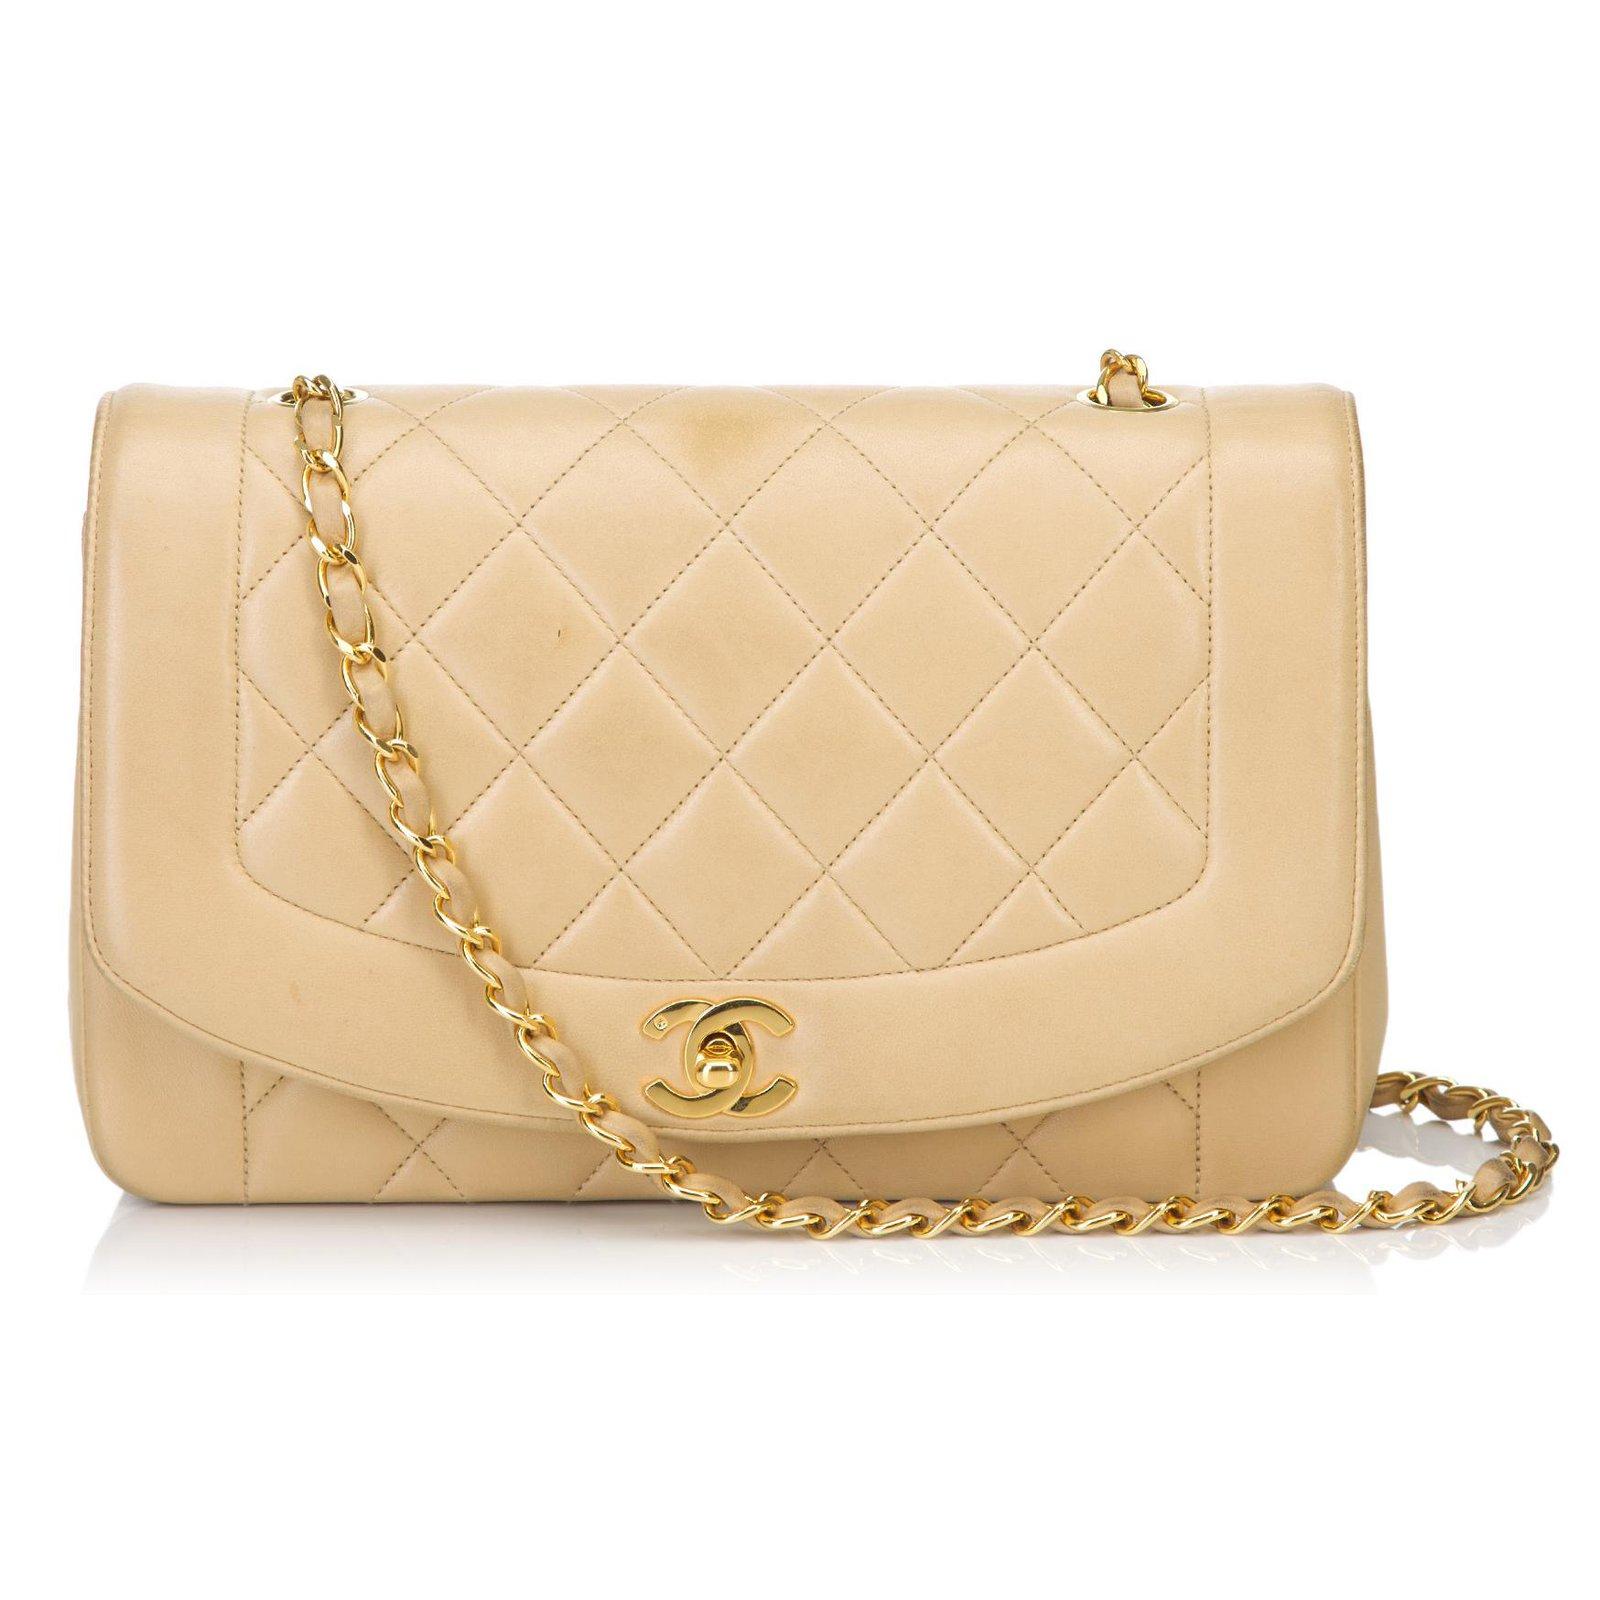 b55739de0b80 Chanel Diana Flap Shoulder Bag Handbags Leather Brown